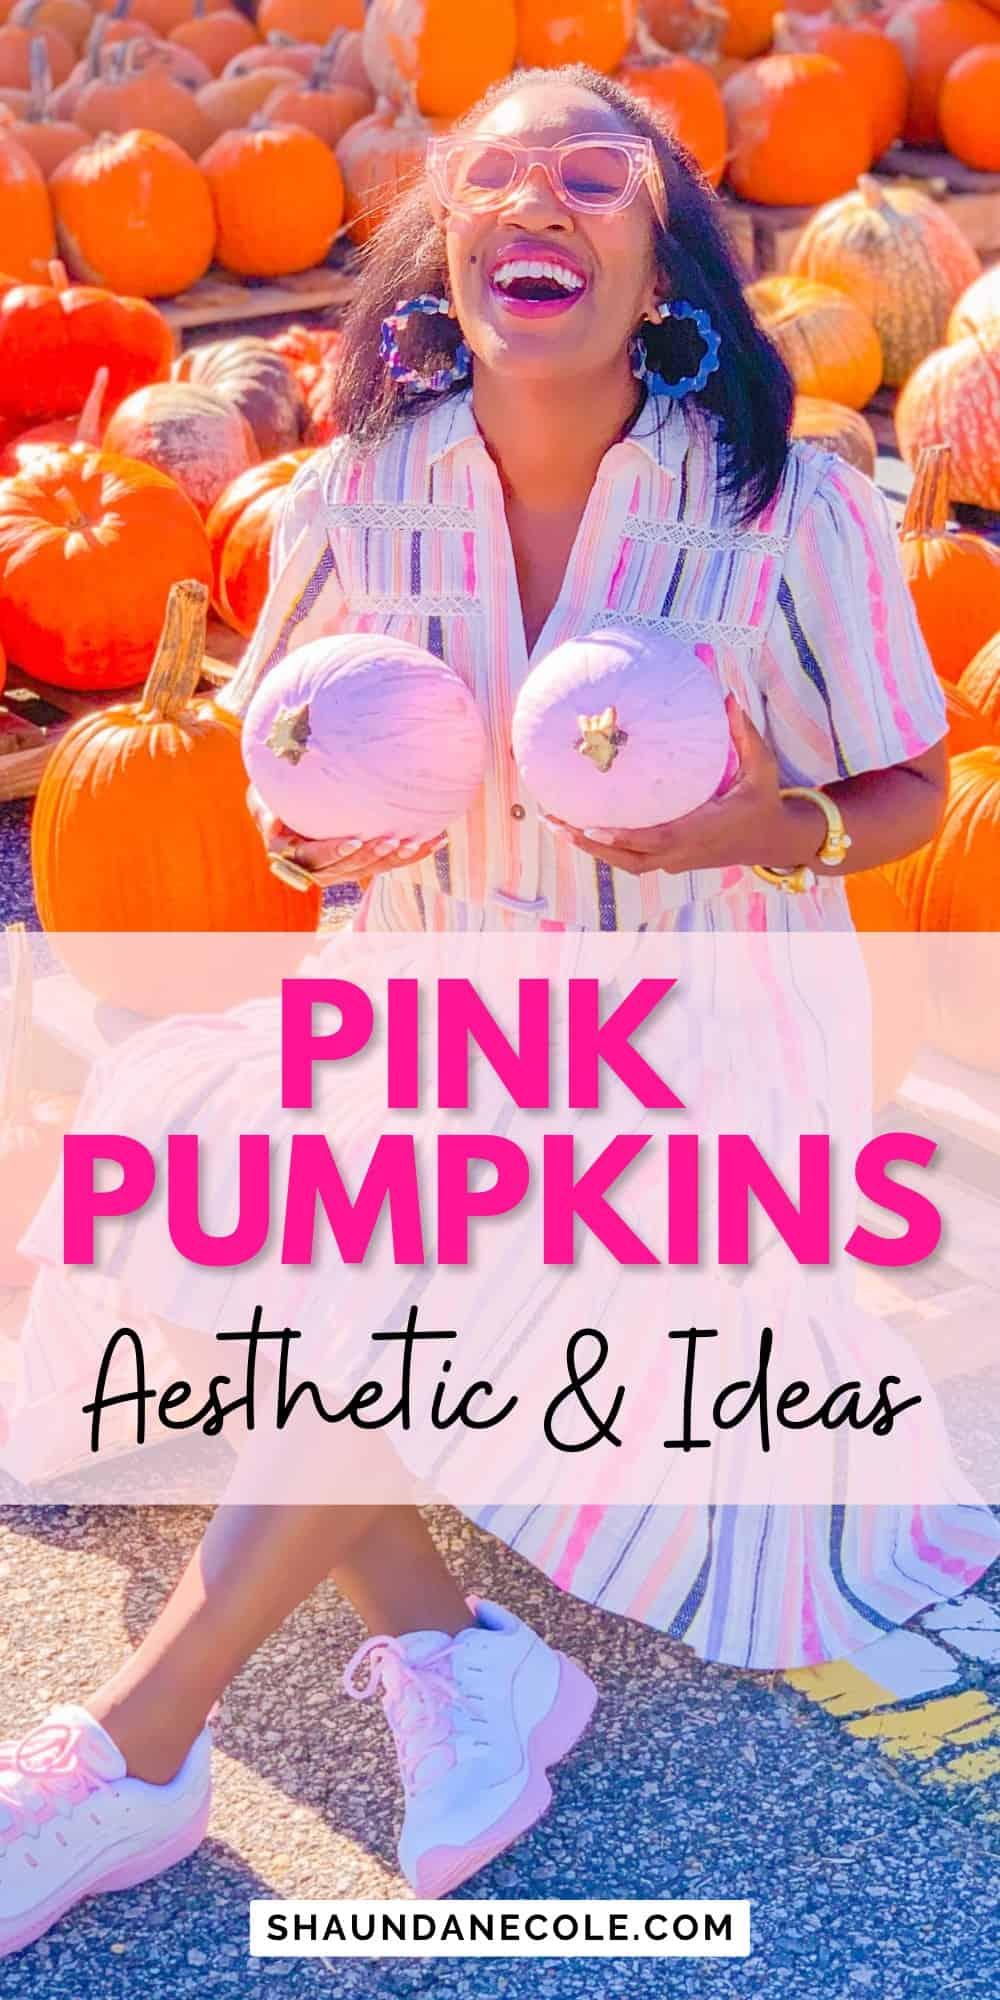 Pink Pumpkins Ideas & Aesthetic